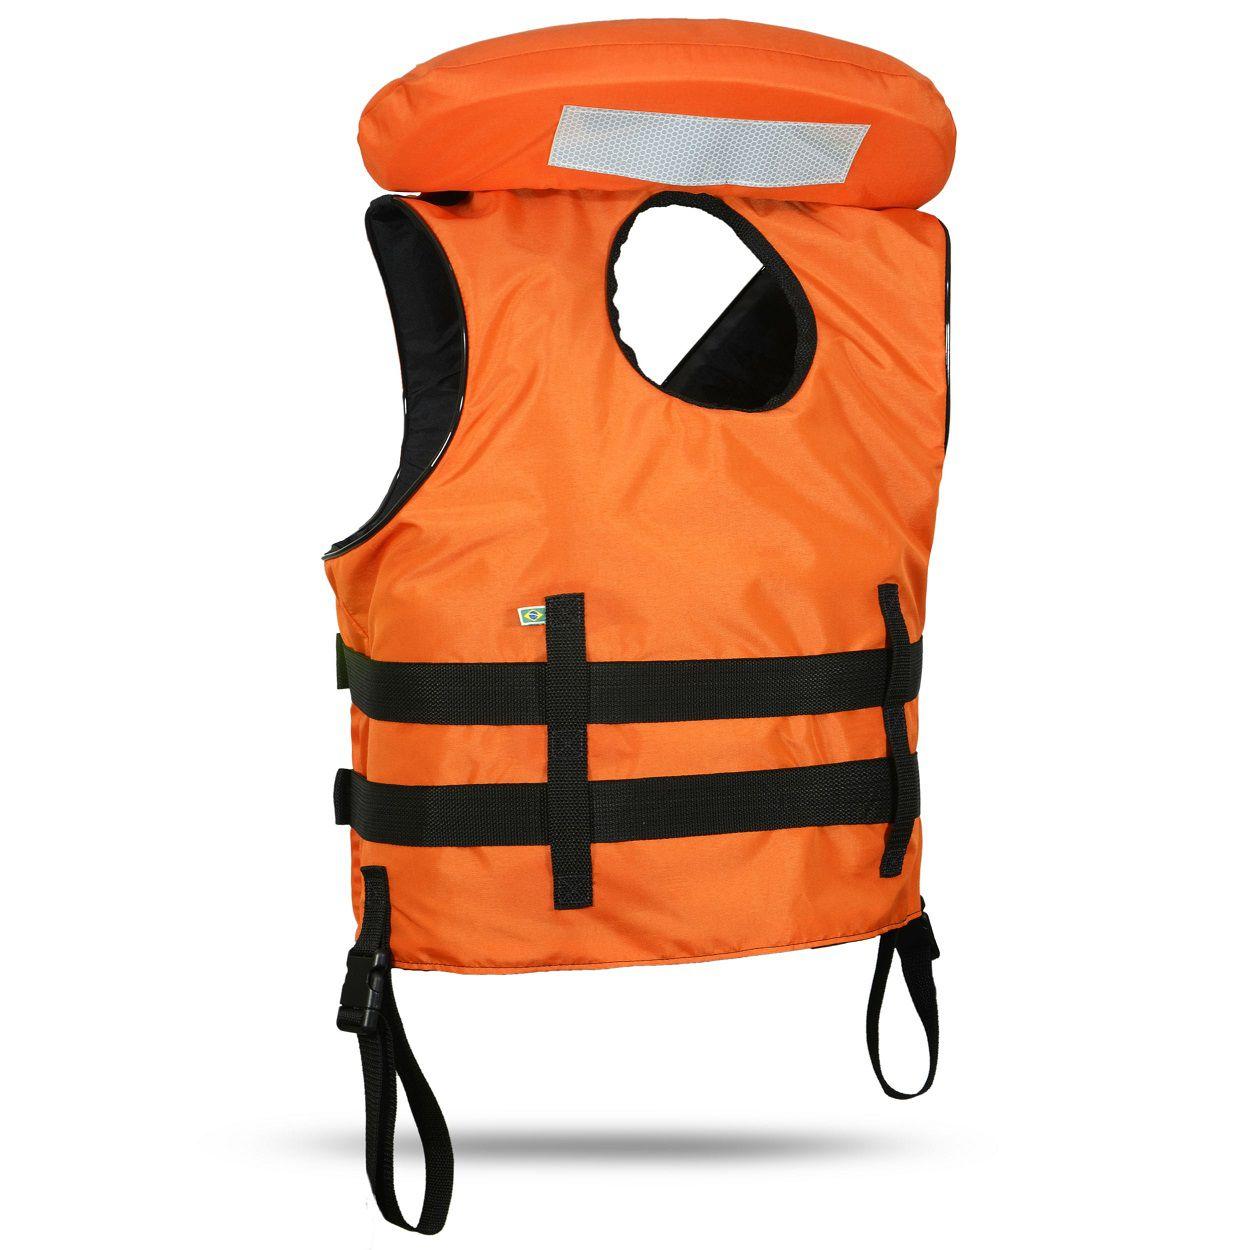 Salva-vidas Vertical Classe IV Completo